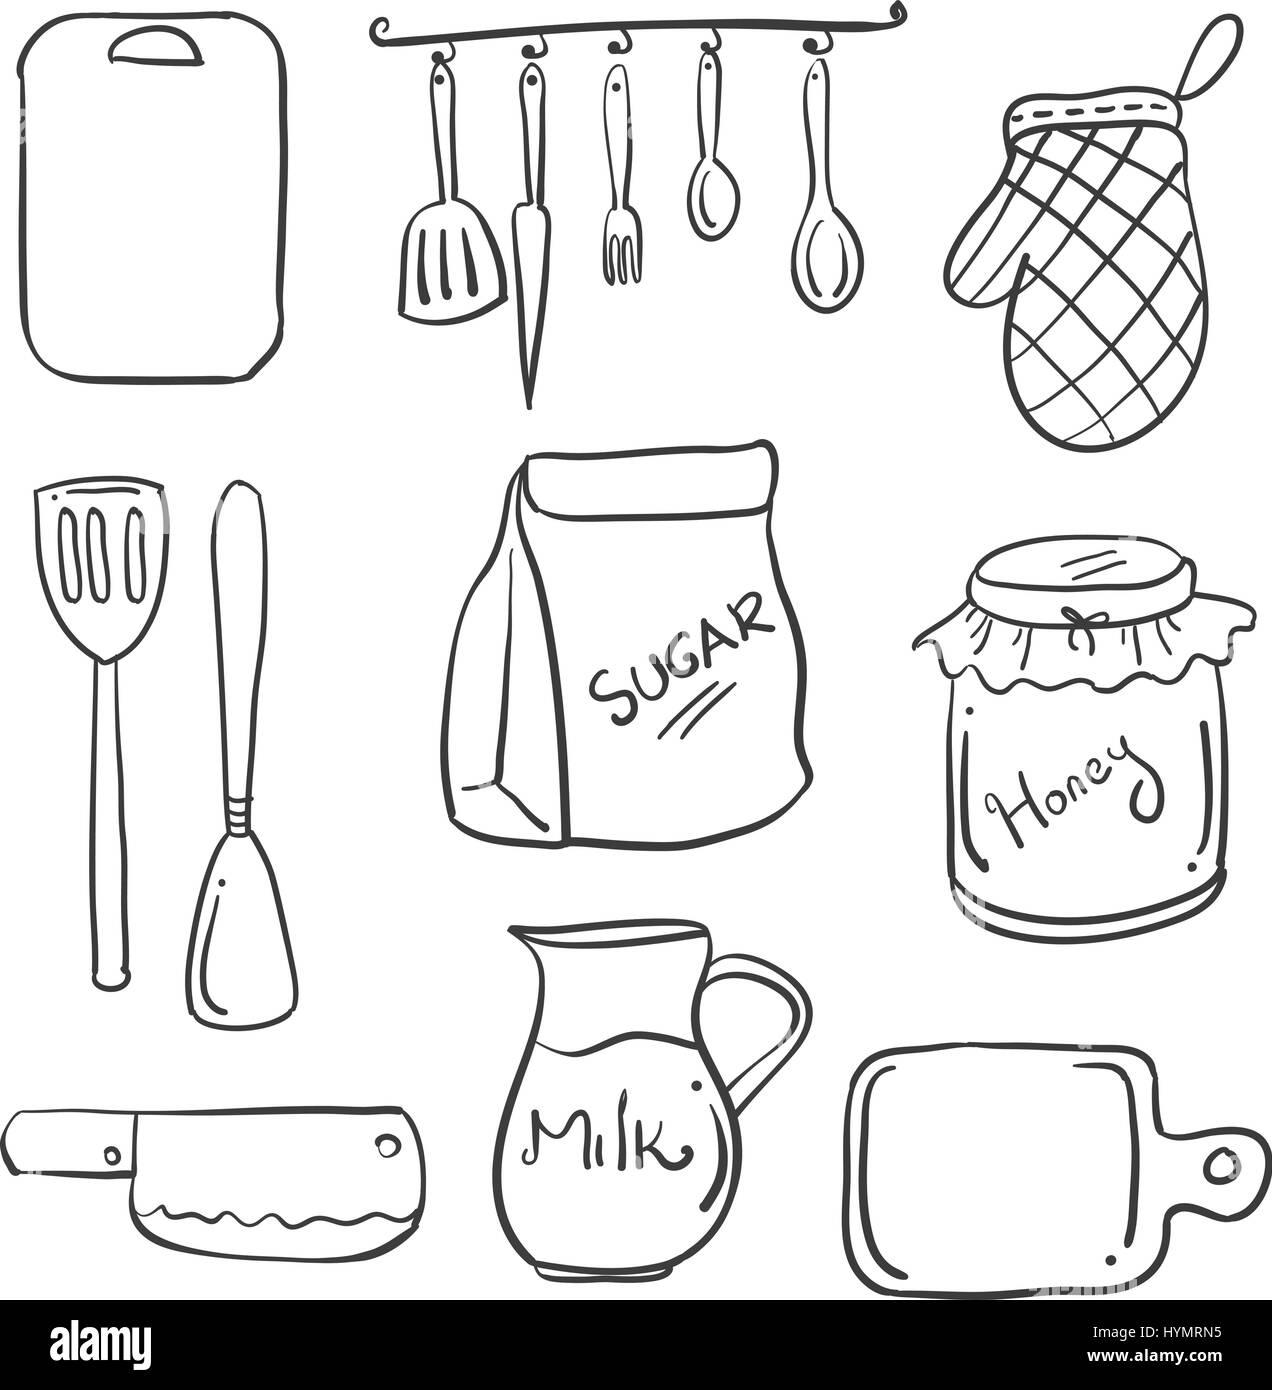 Hand Draw Of Kitchen Set Doodles Stock Vector Art Illustration